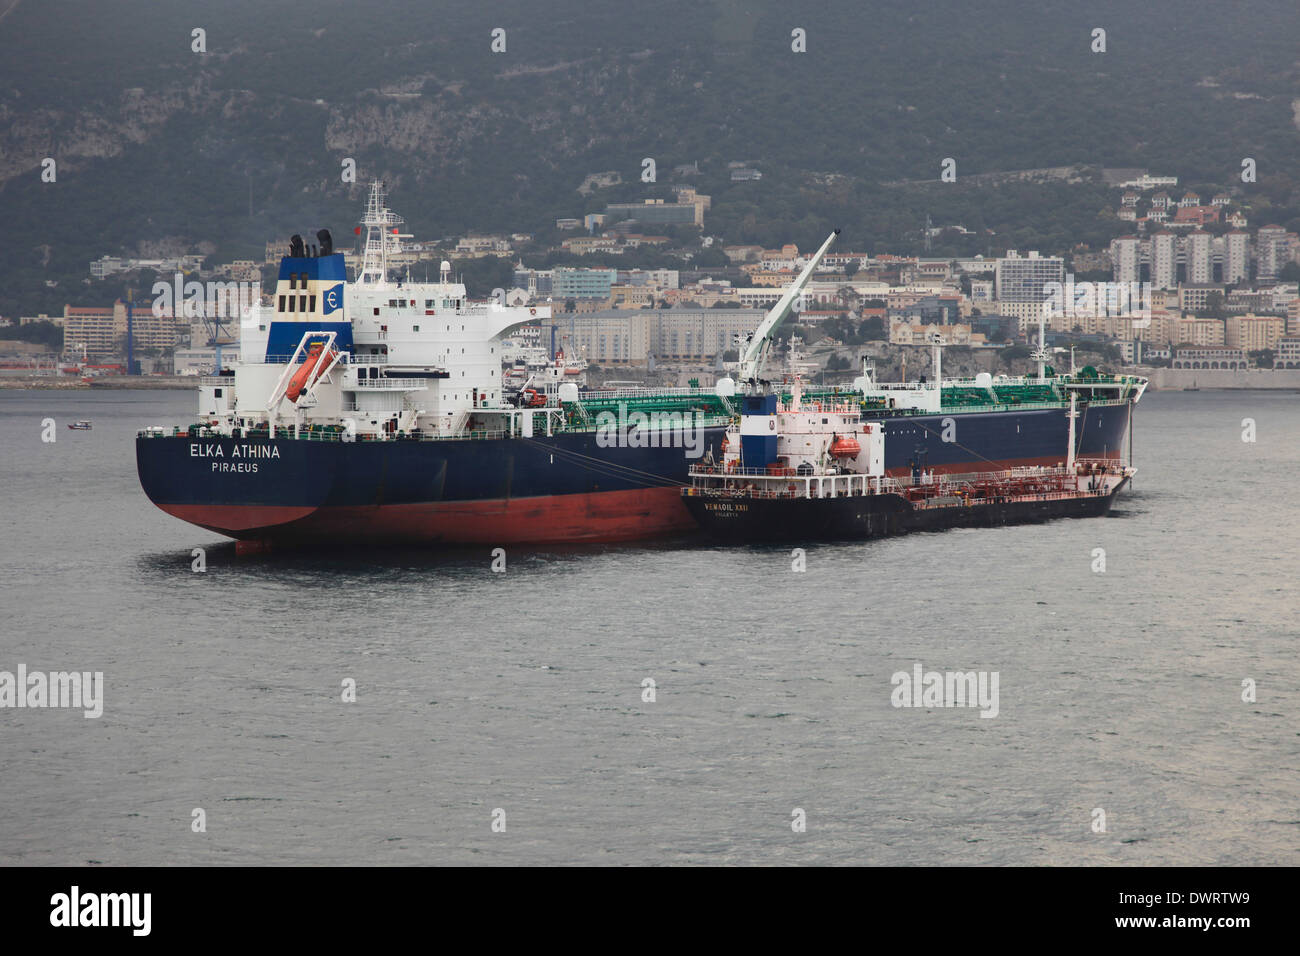 oil tanker mv Elka Athina anchored in Gibraltar harbor with bunkering tanker mv Vemaoil XXII alongside - Stock Image